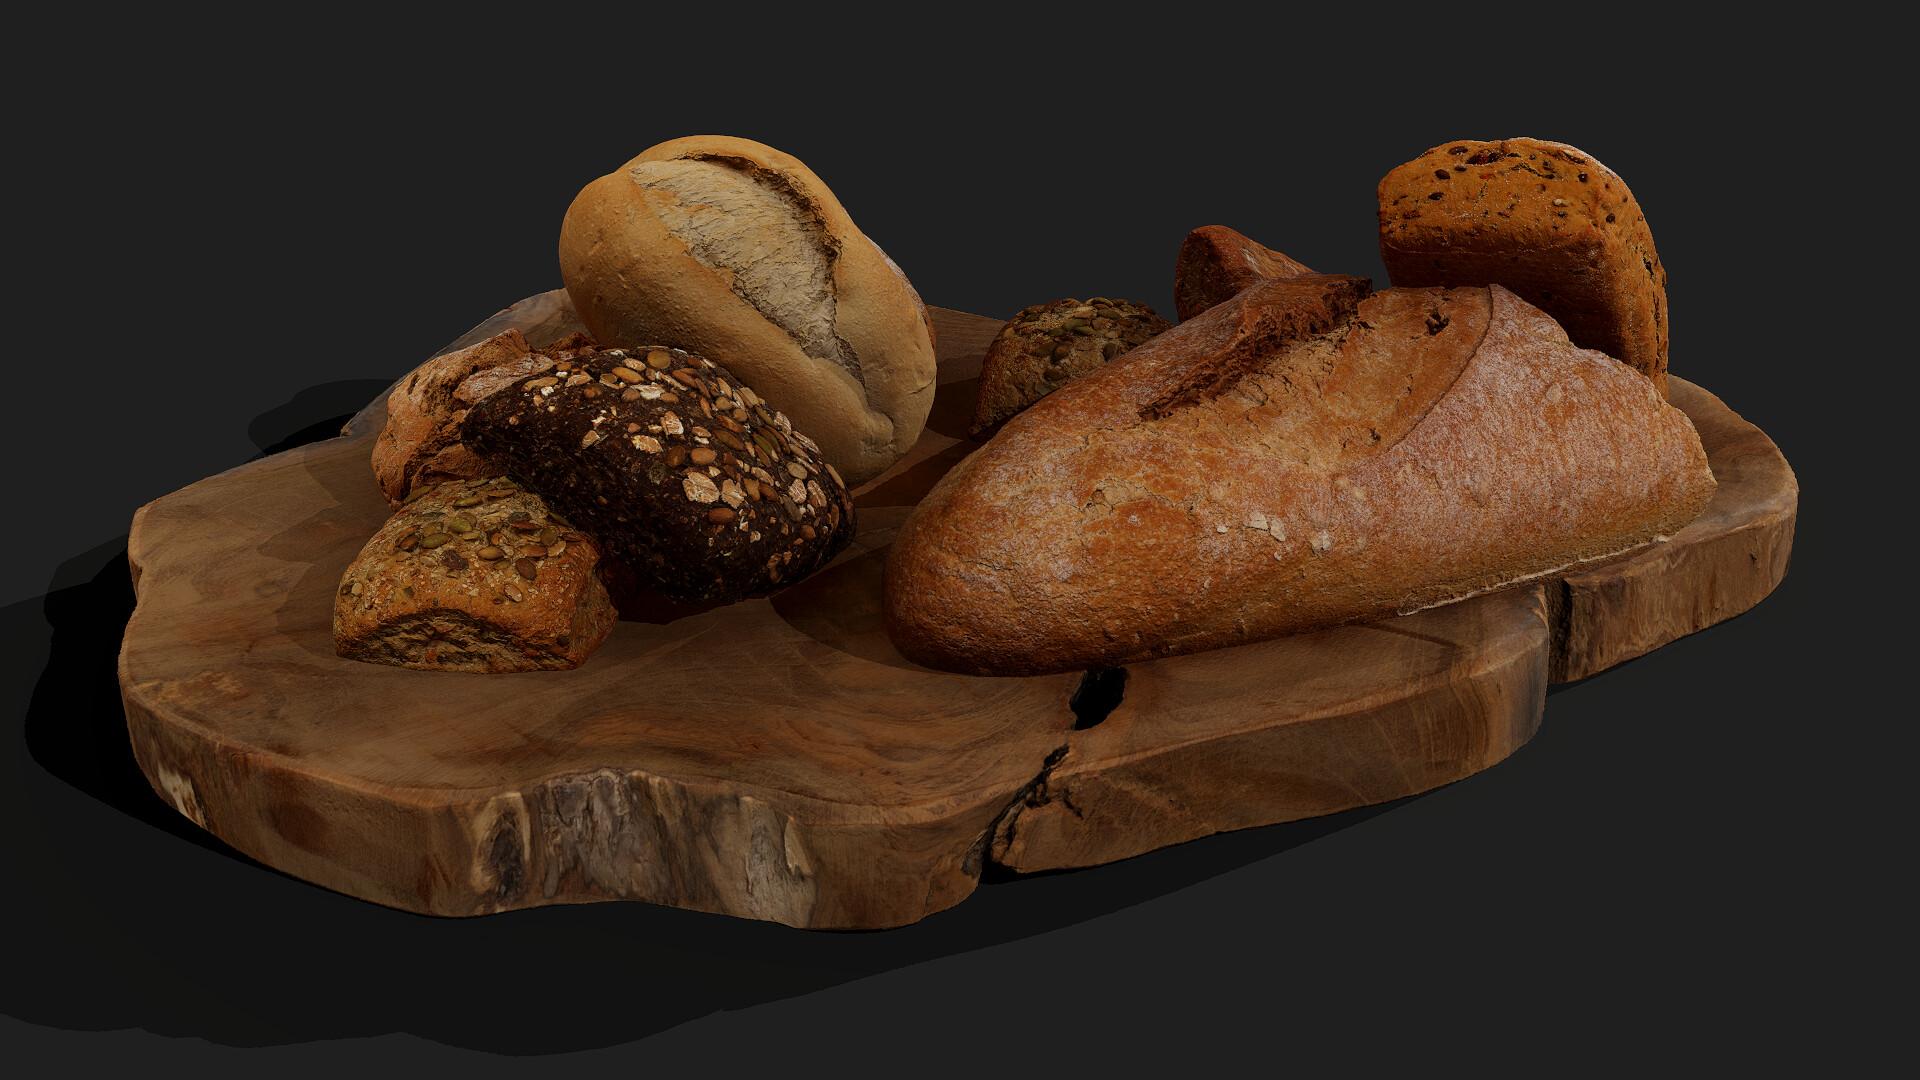 Bread and Bread Rolls